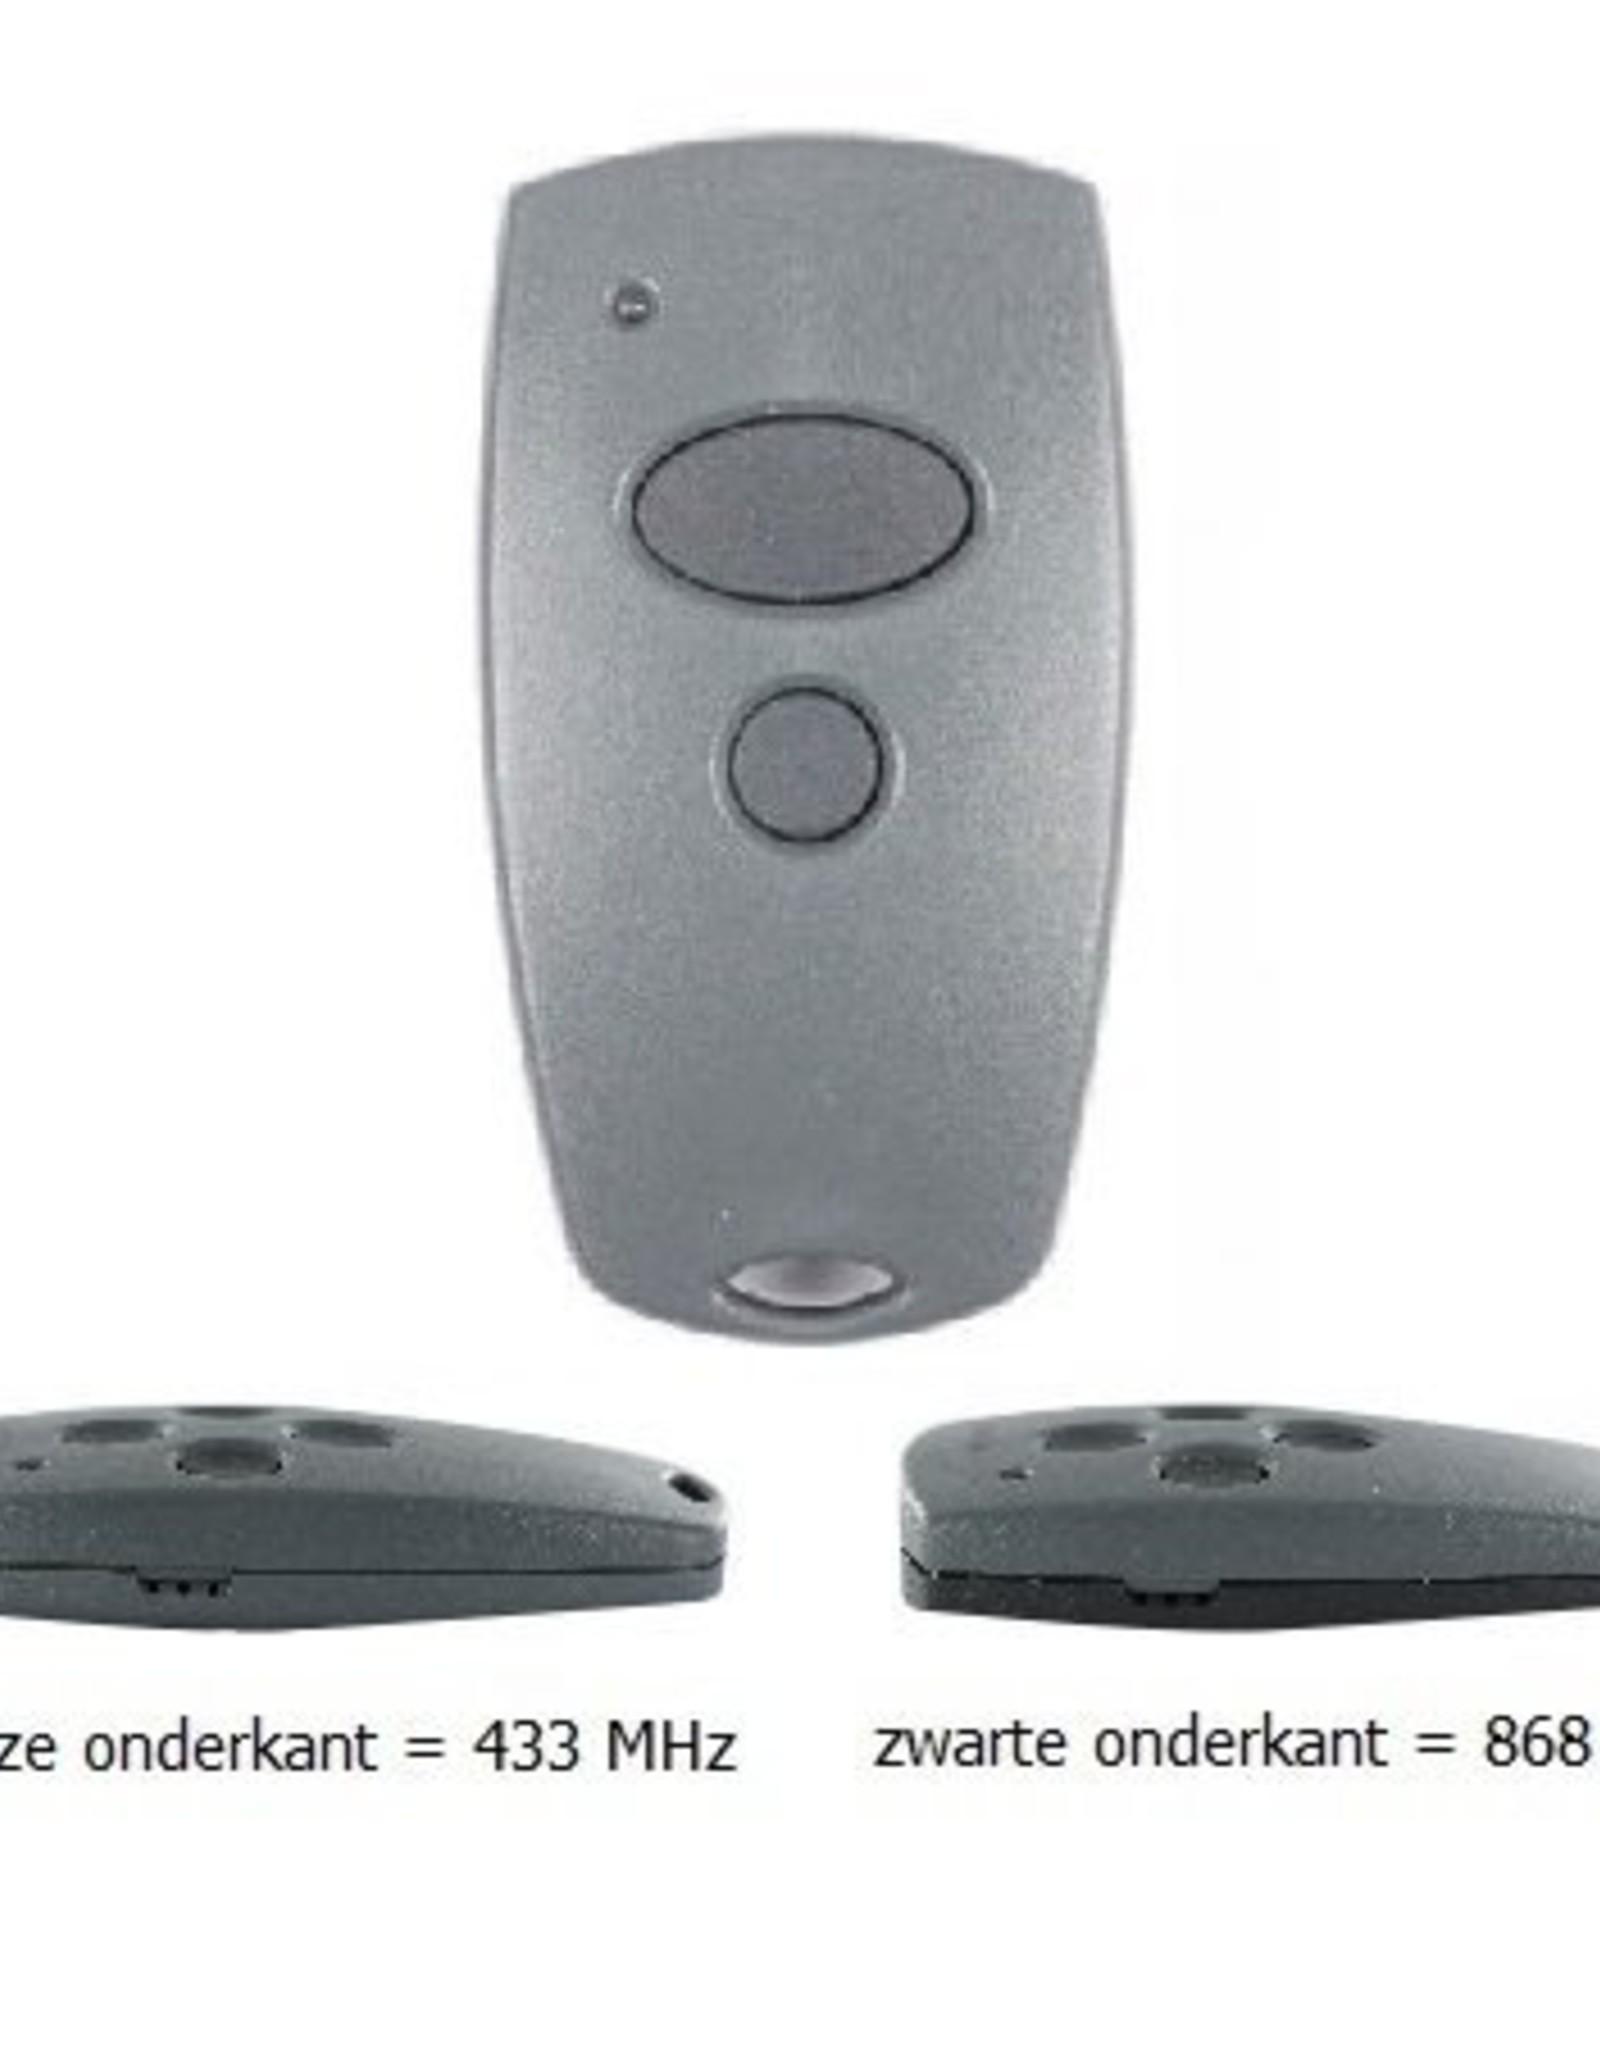 Marantec Marantec Digital 302 Multi-bit 2 kanaals handzender - 868 MHz